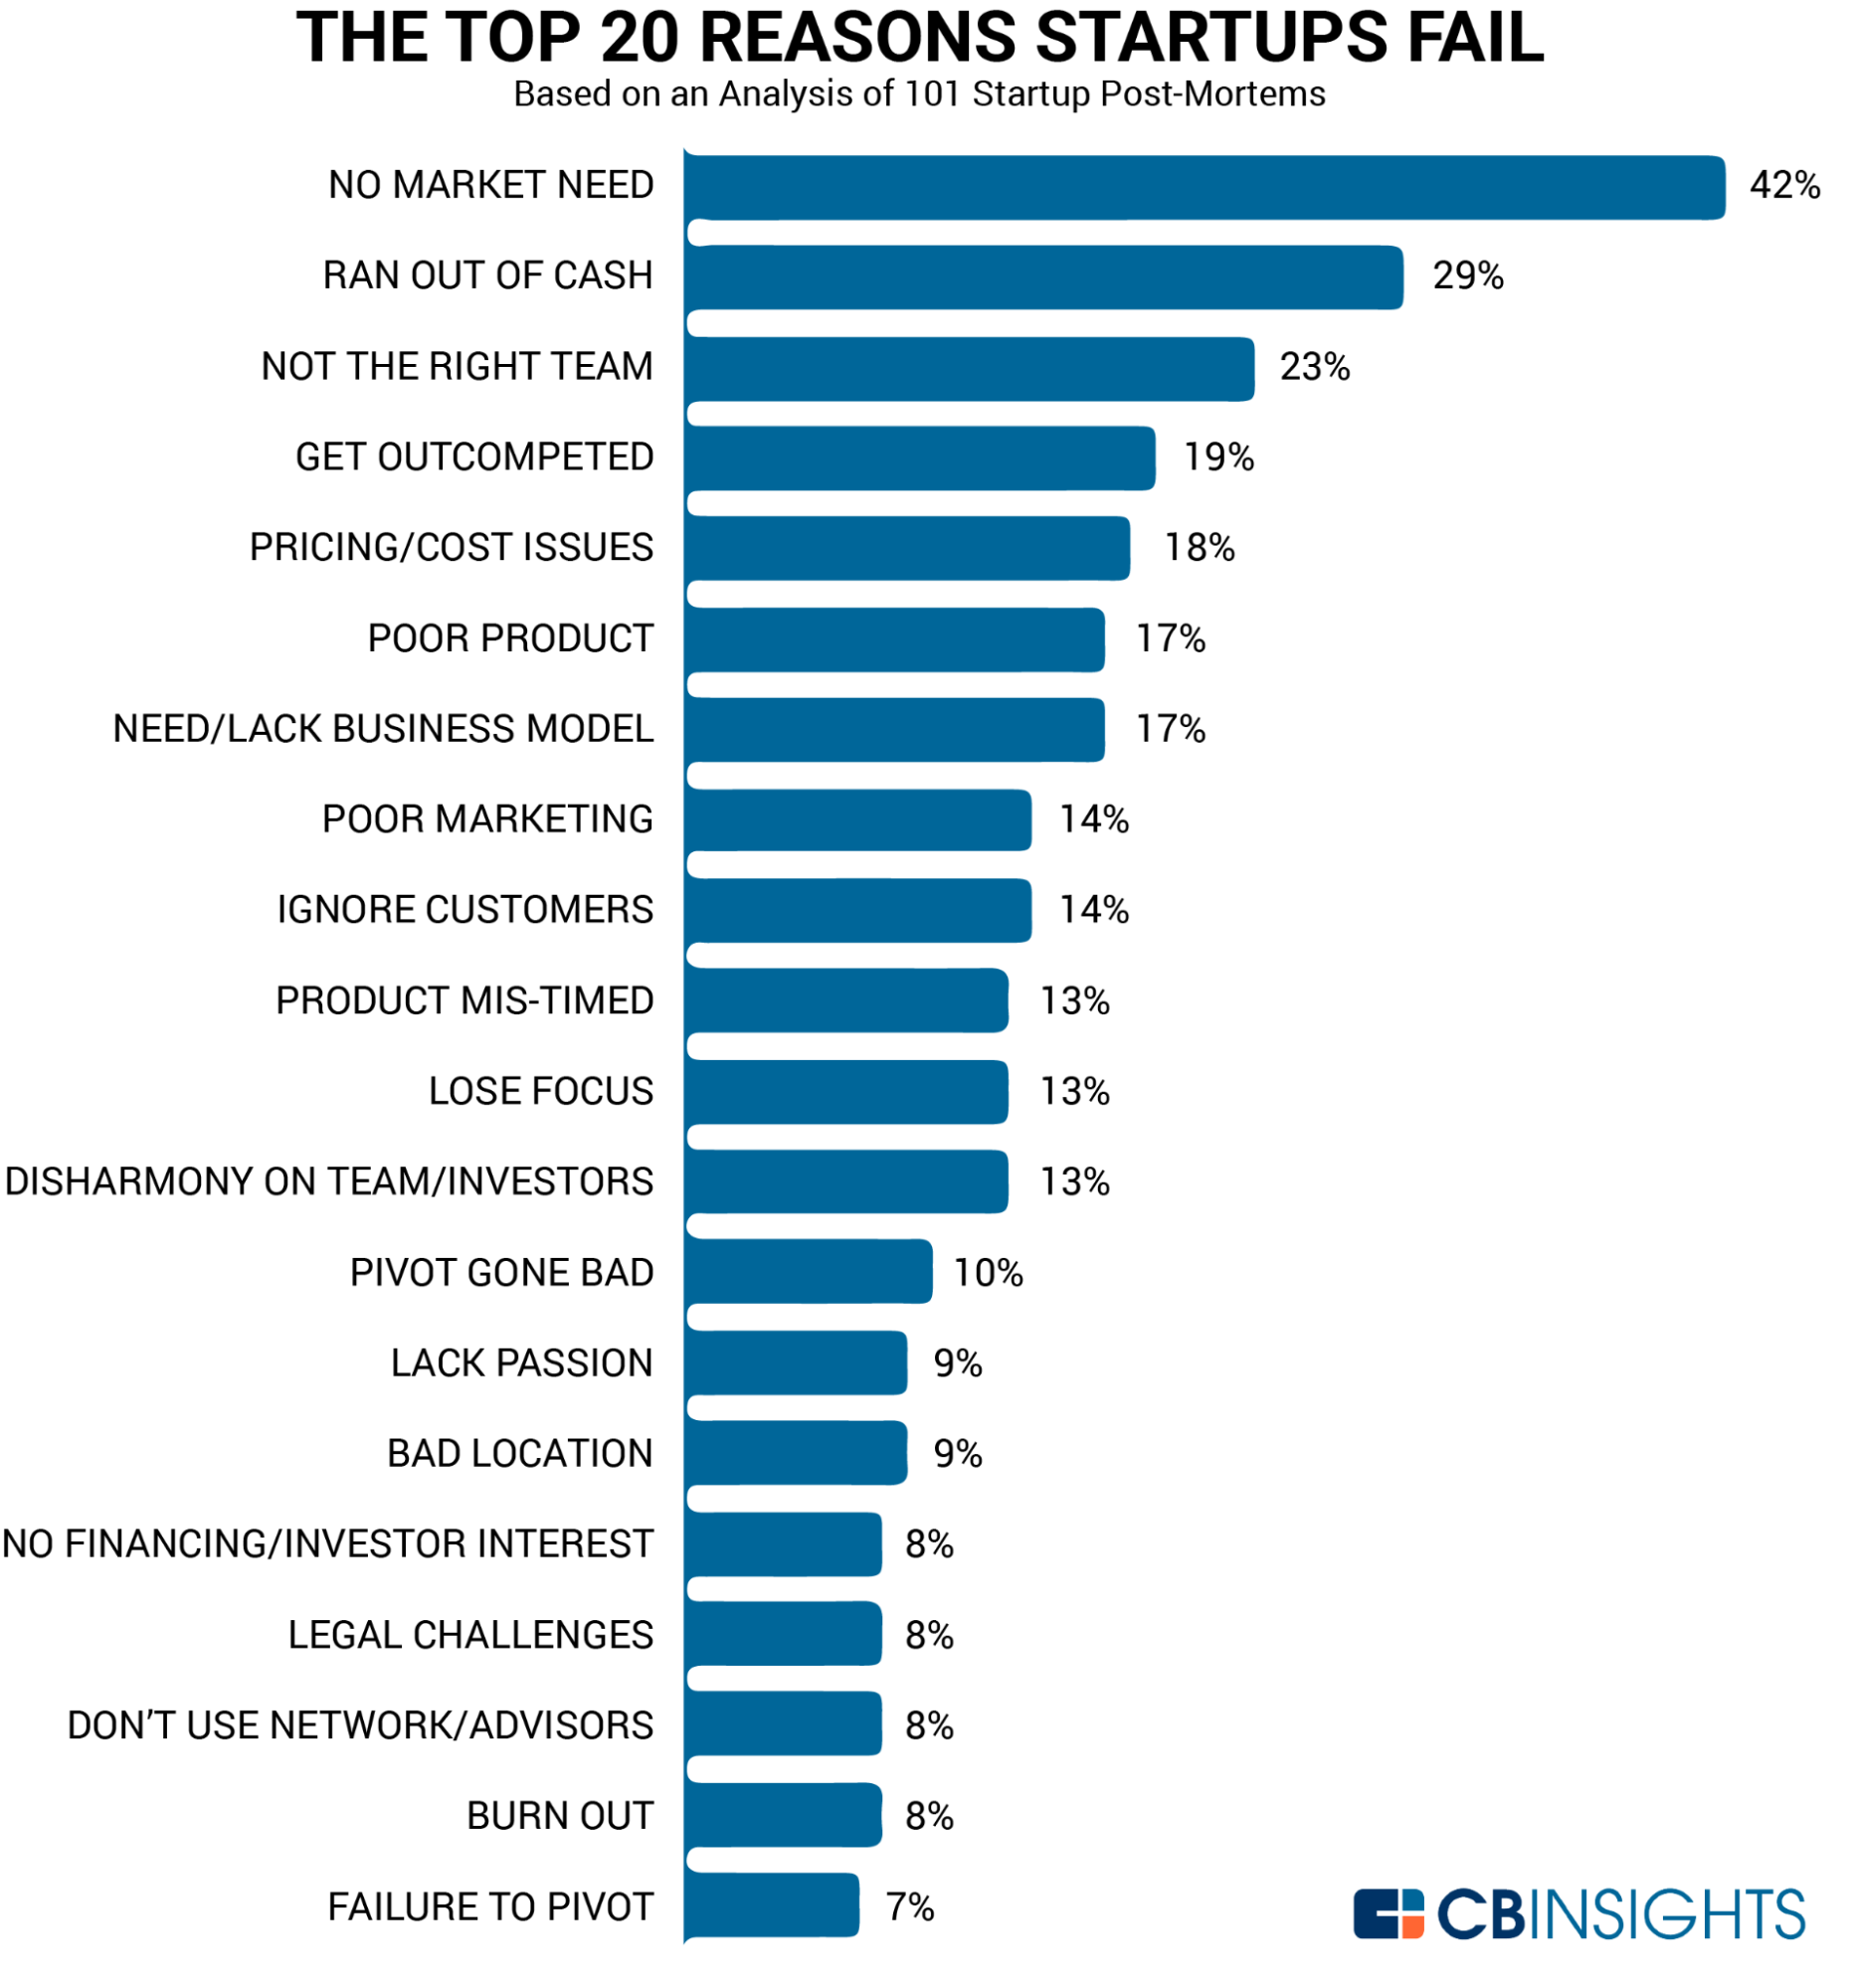 Reasons Why Startups Fail